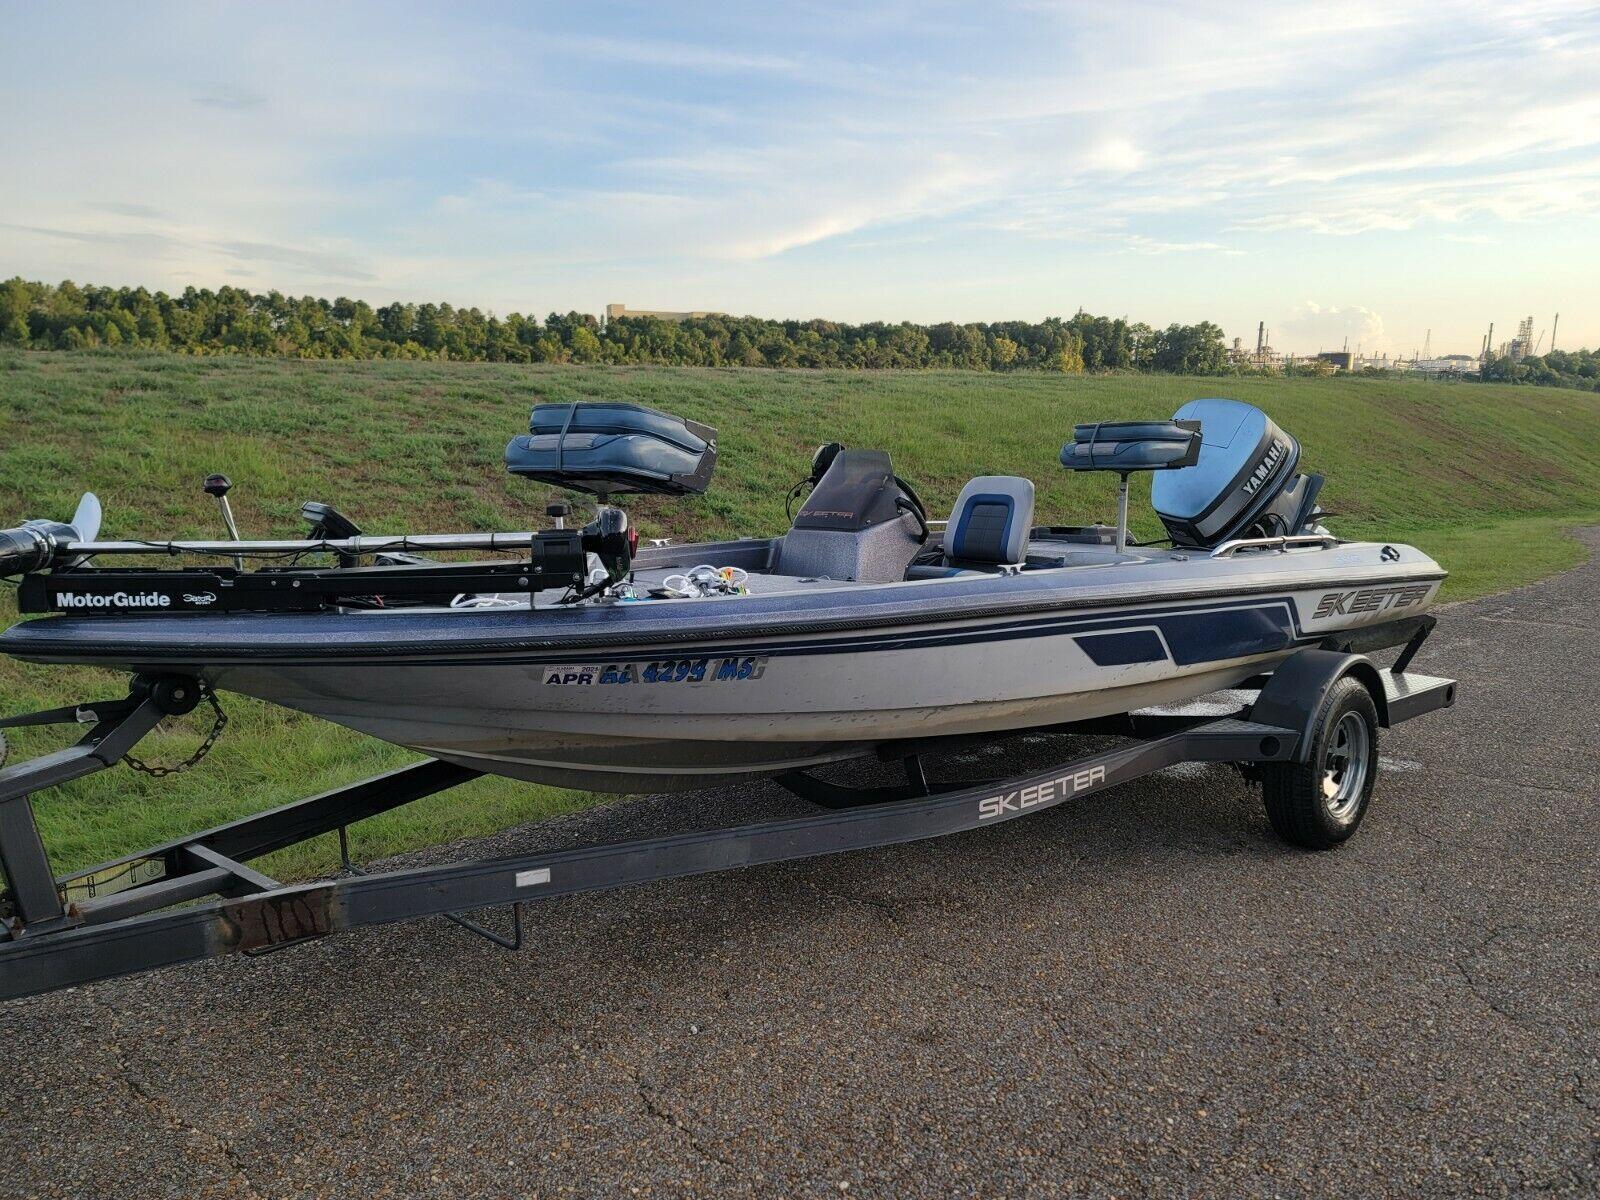 1993 ss140 Skeeter bass boat with 115 Yamaha motor